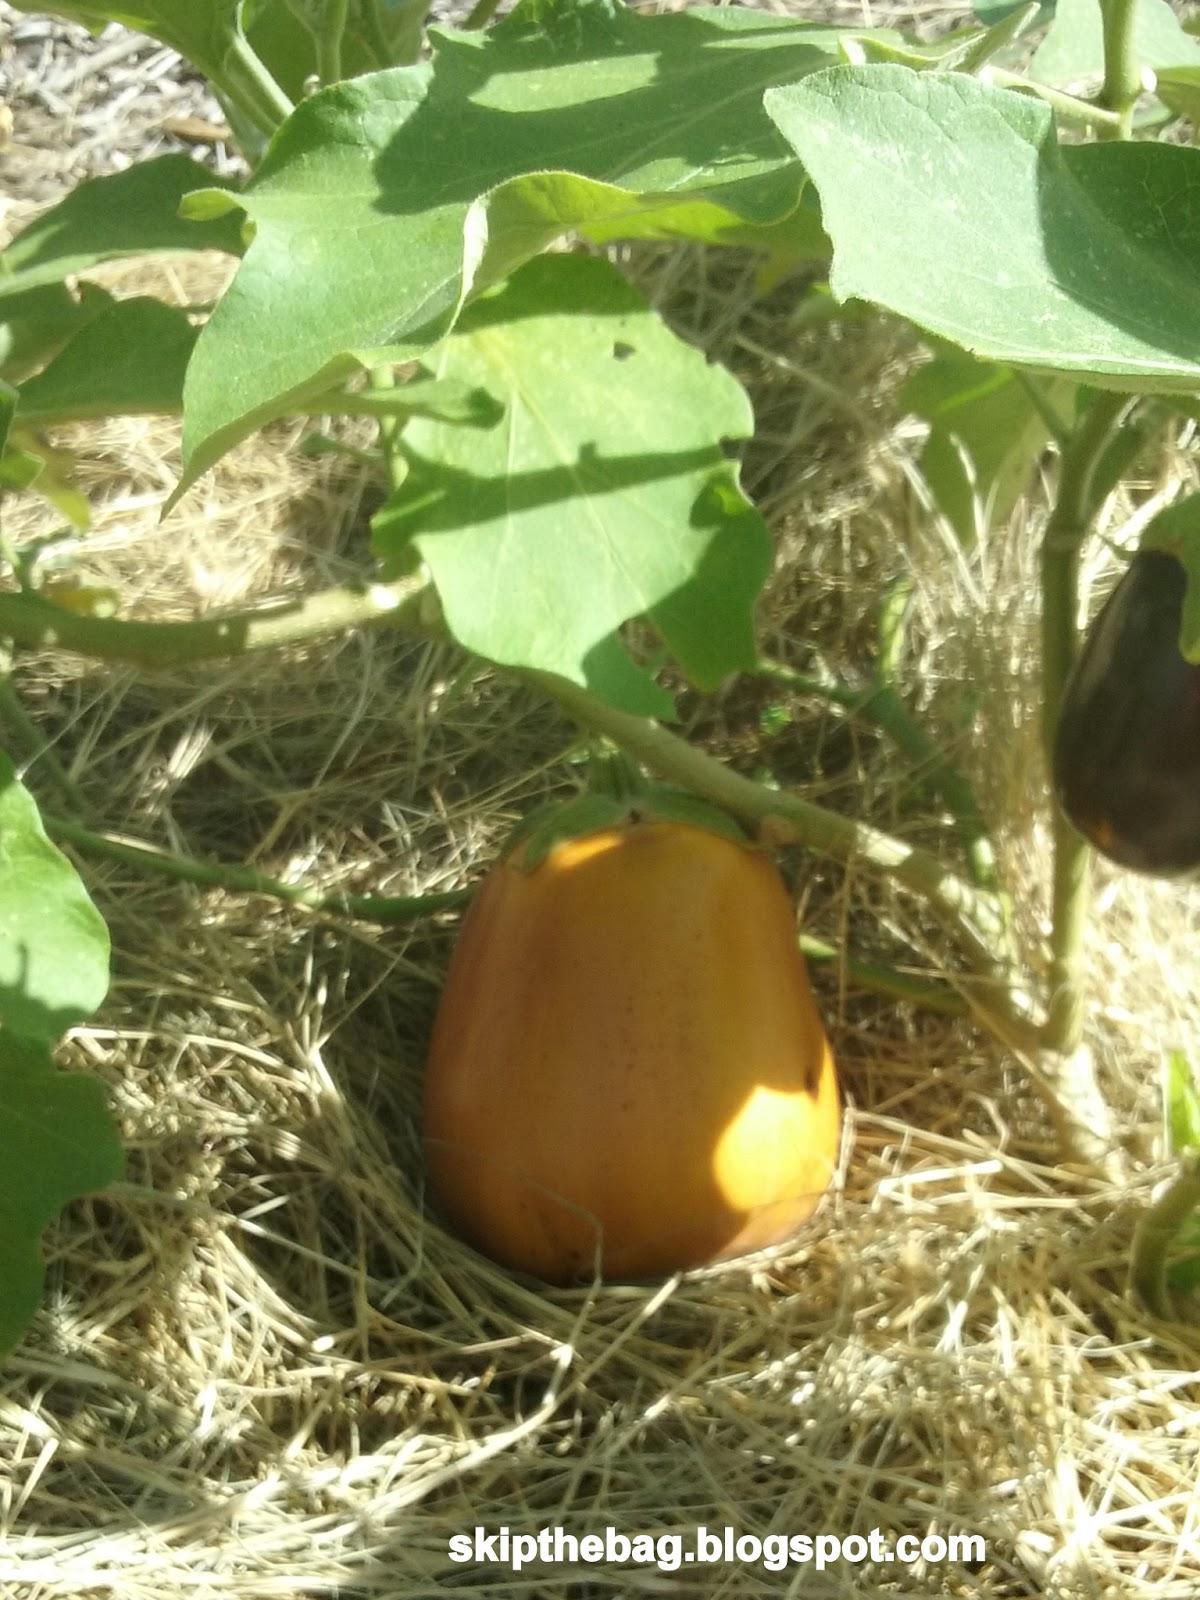 Skip The Bag When To Harvest Eggplant Eggplant Parmesan Recipe